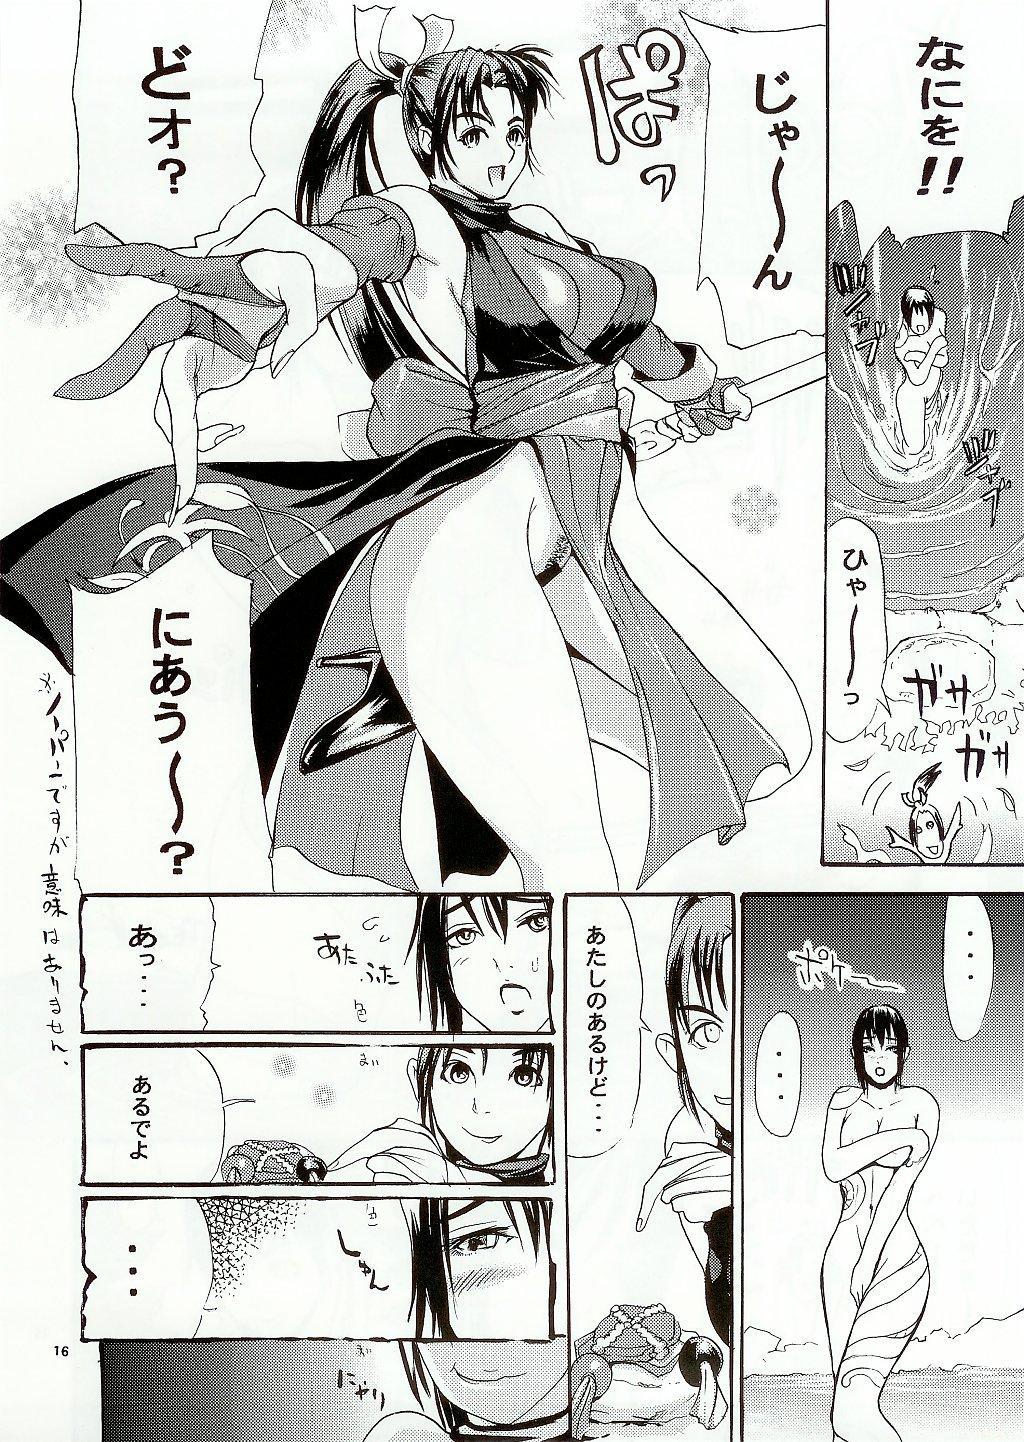 Thultwul Keikaku Vol. 3 15